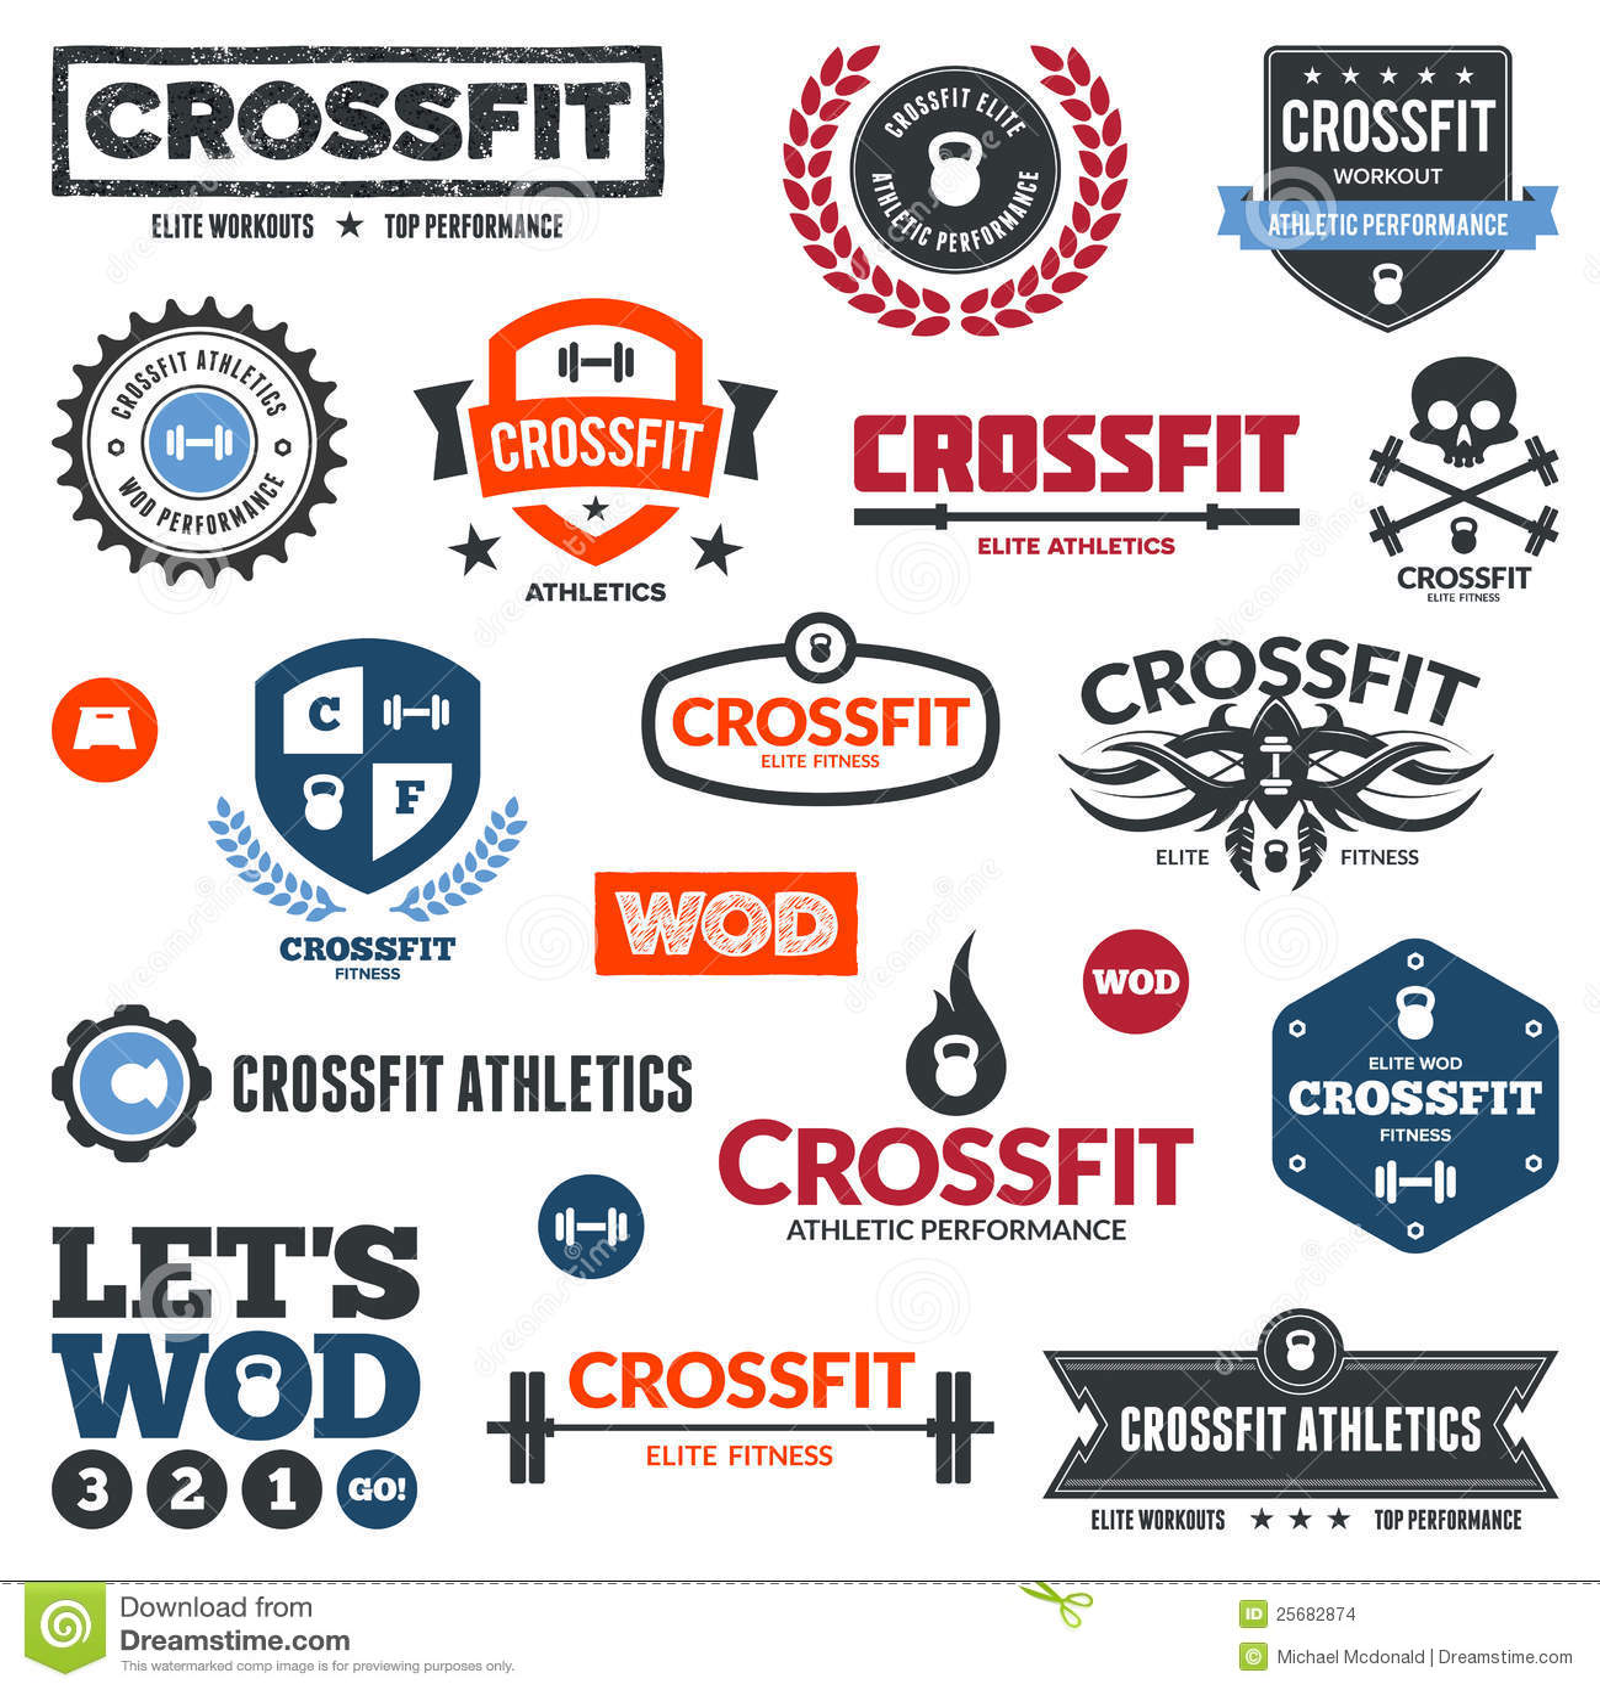 Crossfit athletics graphics